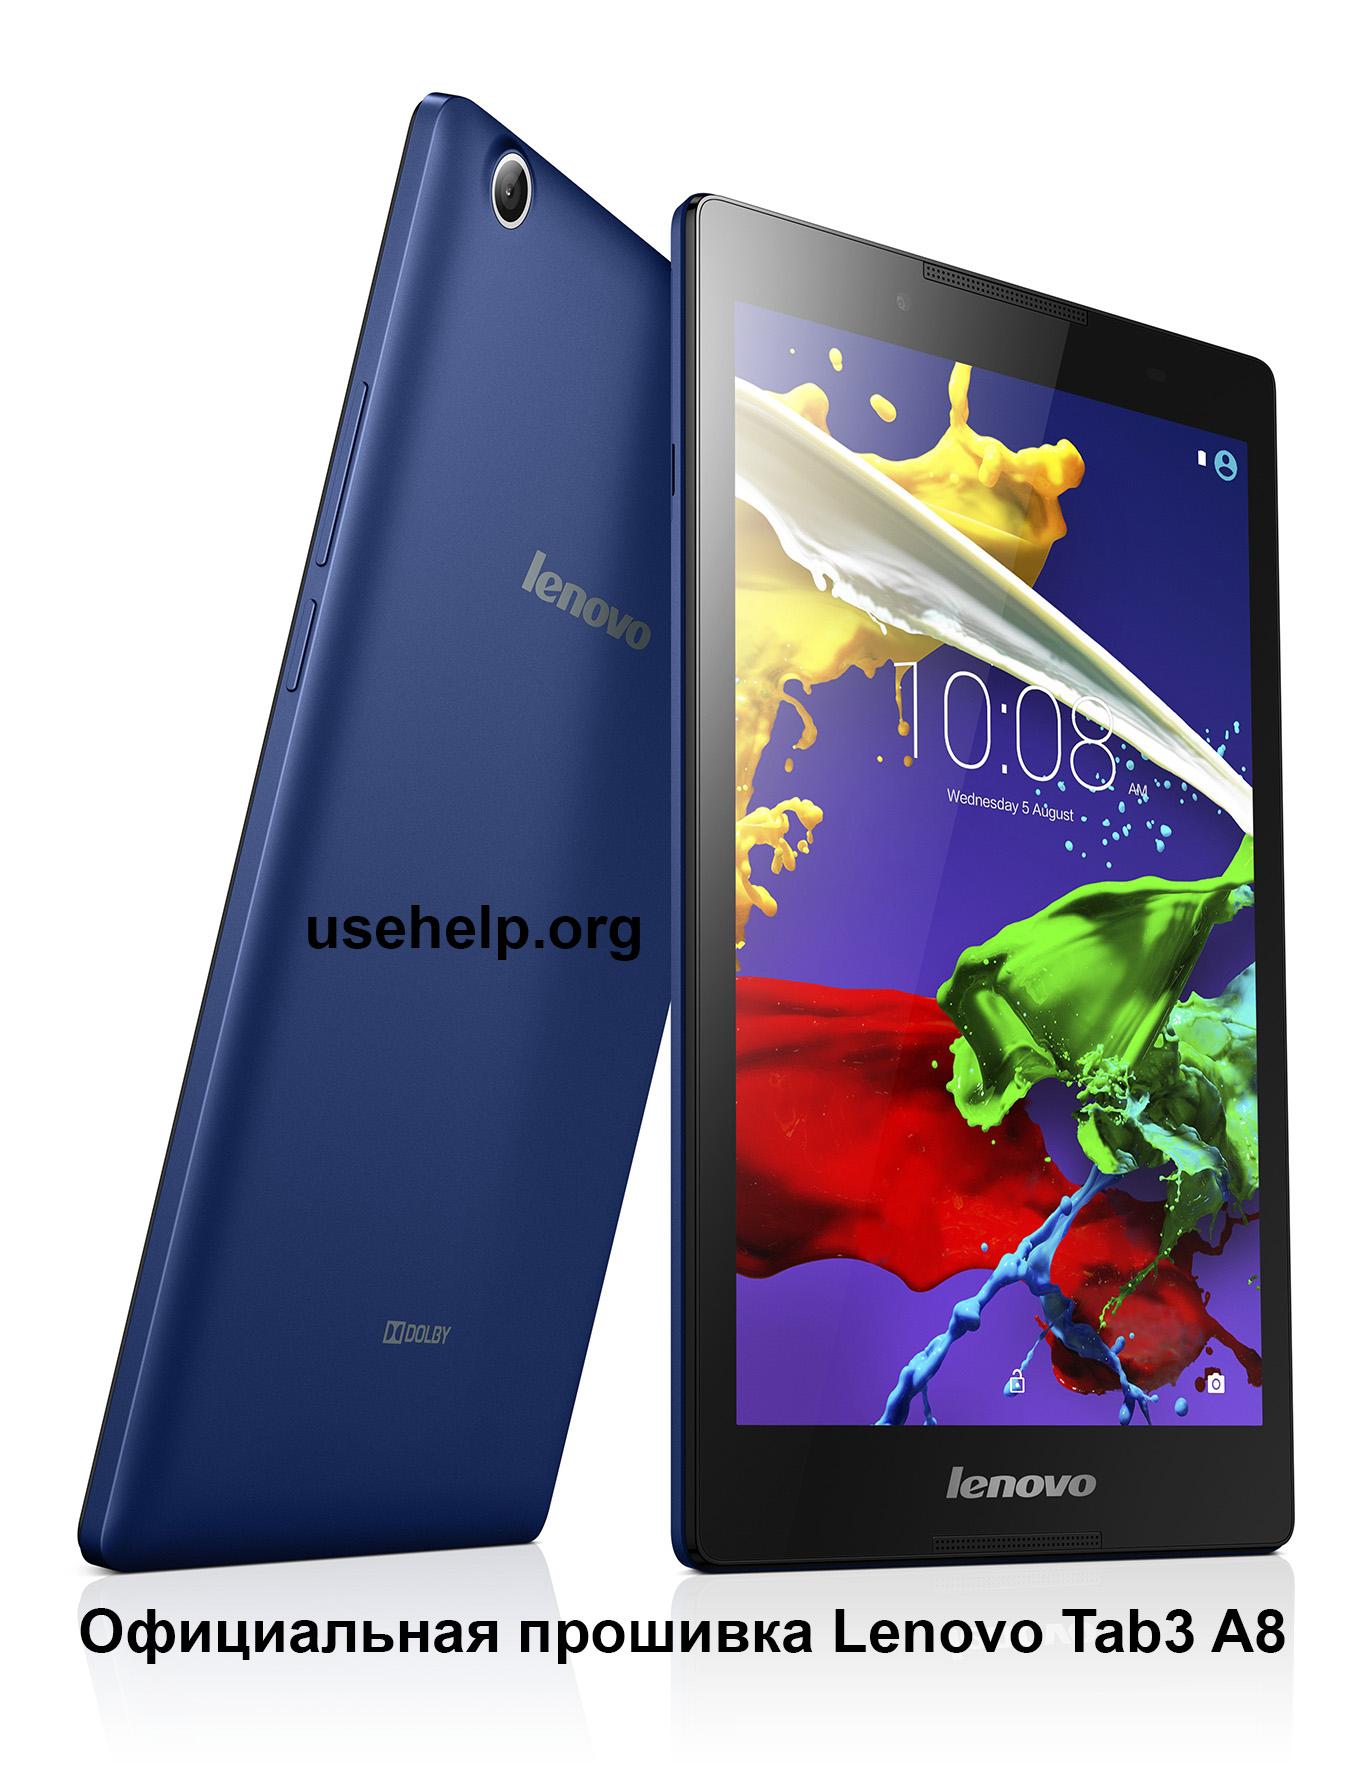 Официальная прошивка Lenovo Tab3 A8